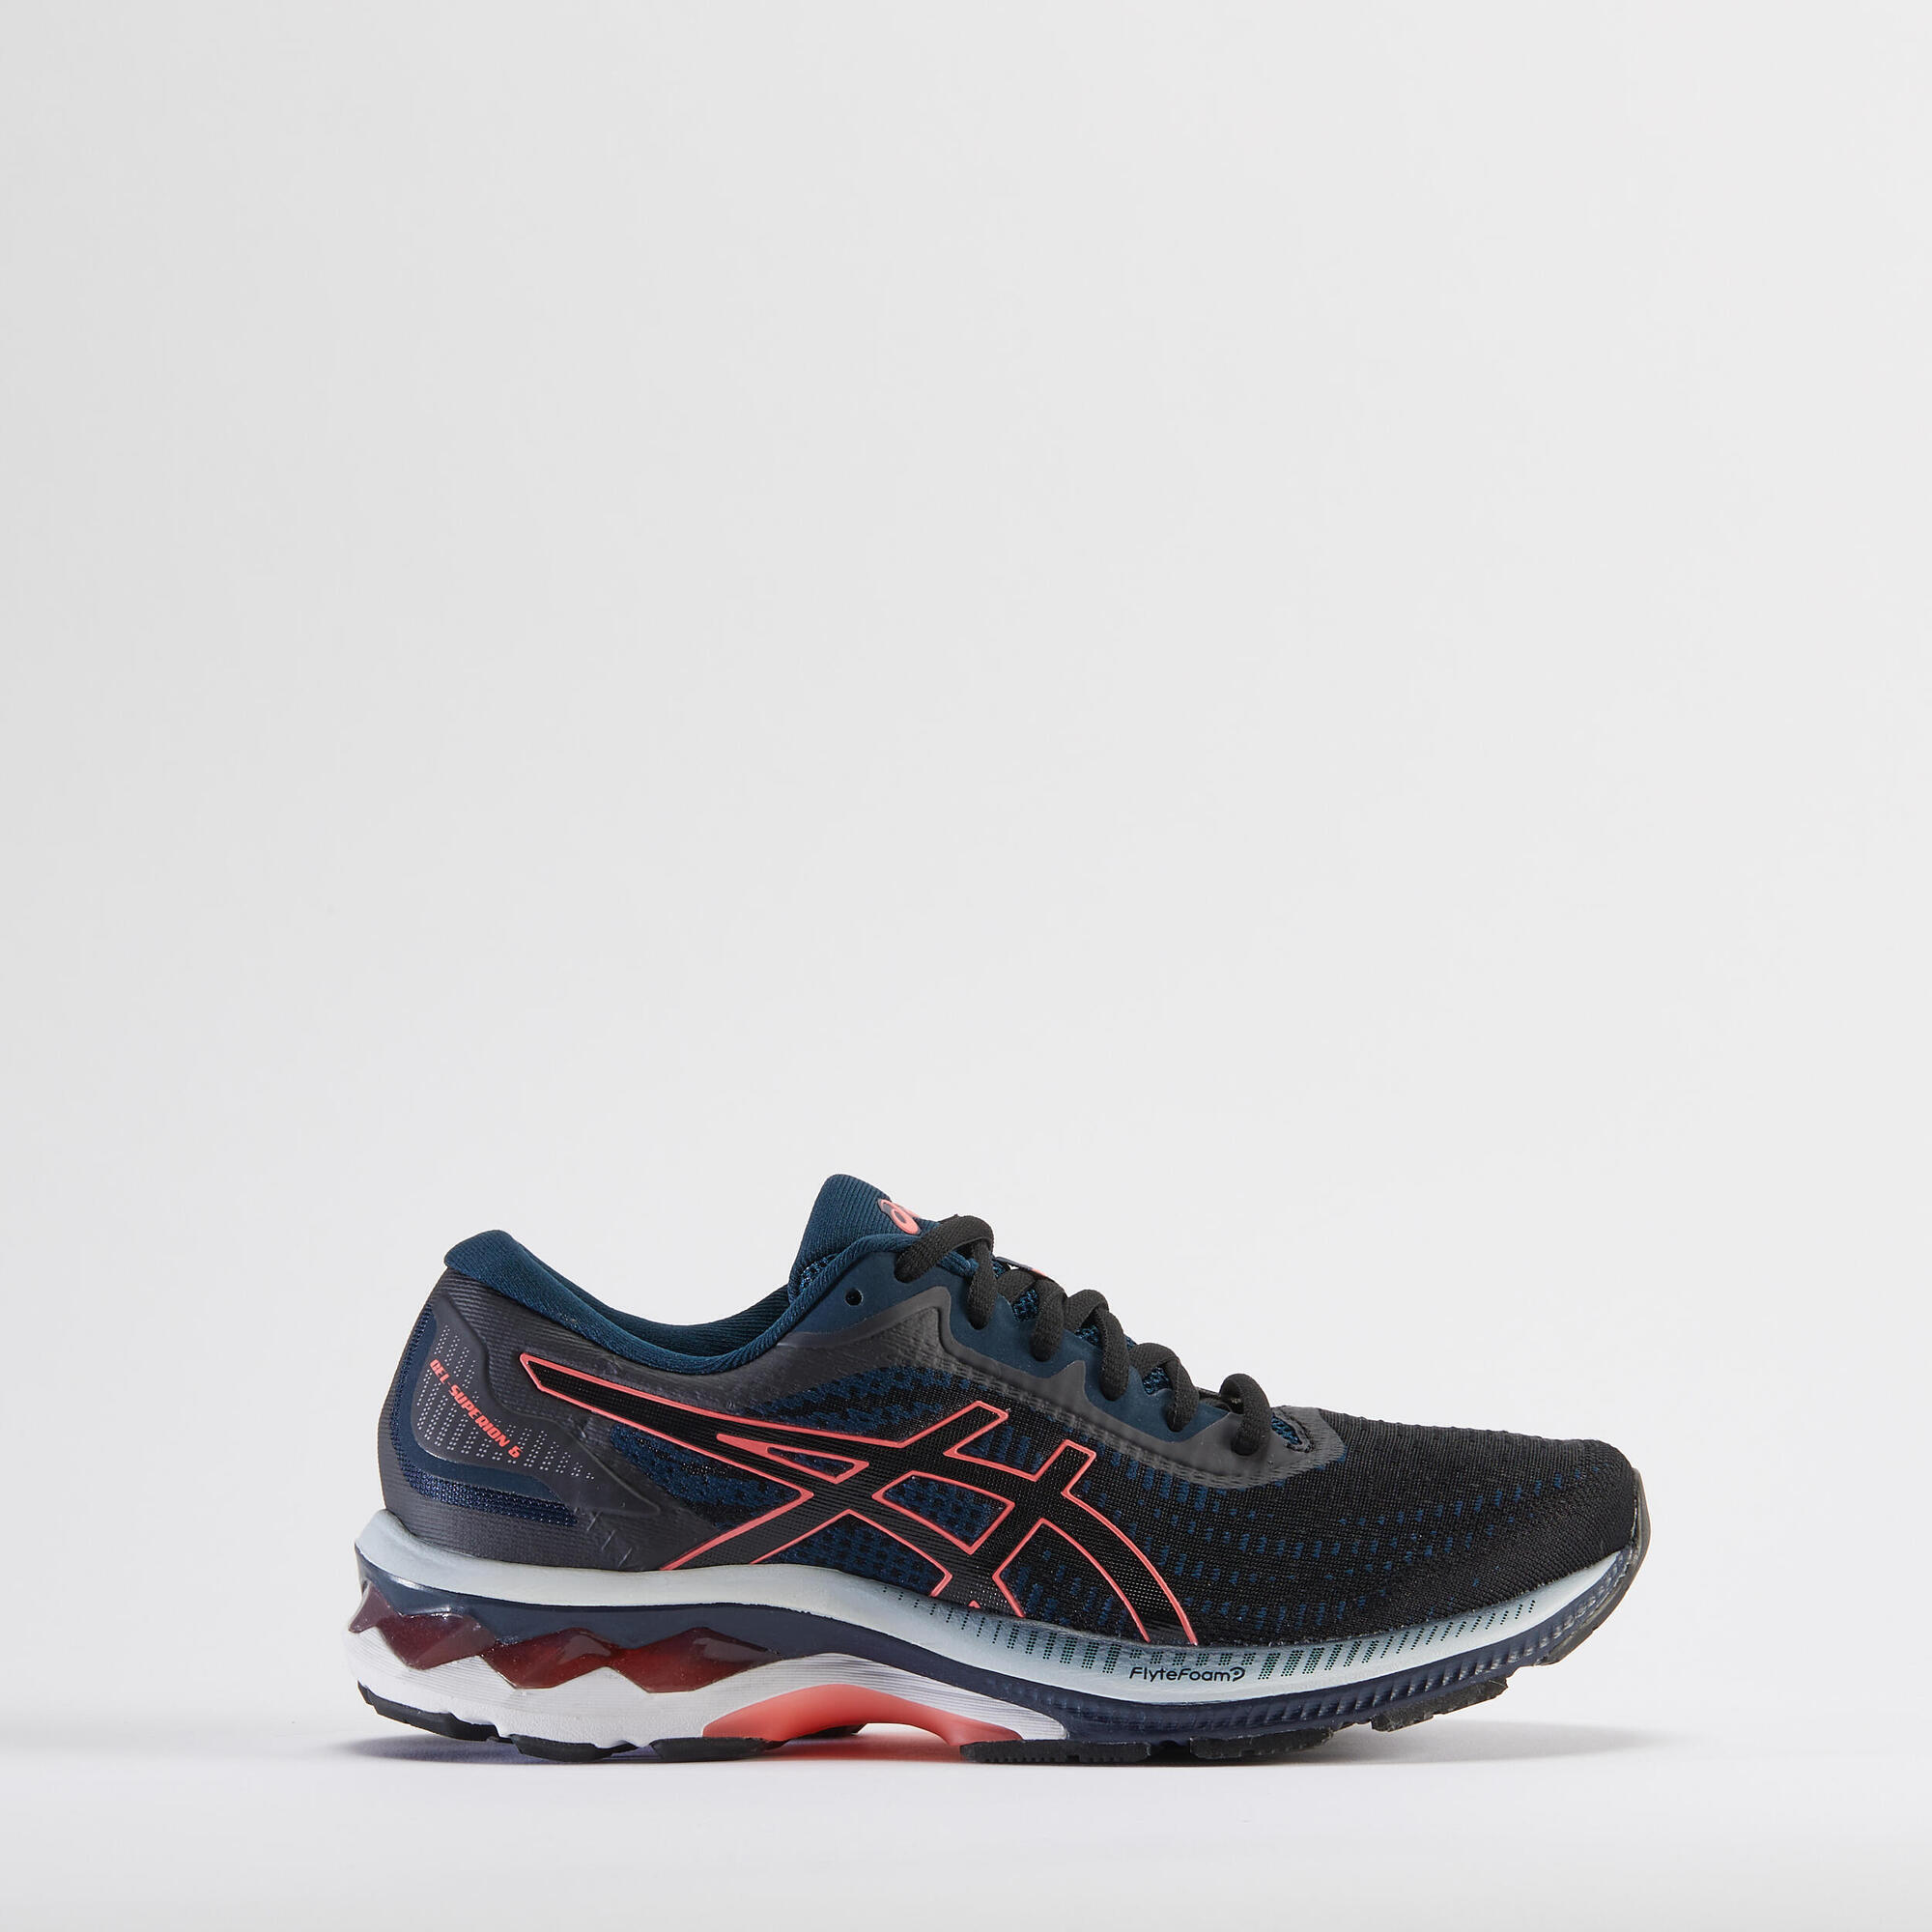 Chaussures running femme Asics | DECATHLON | Decathlon